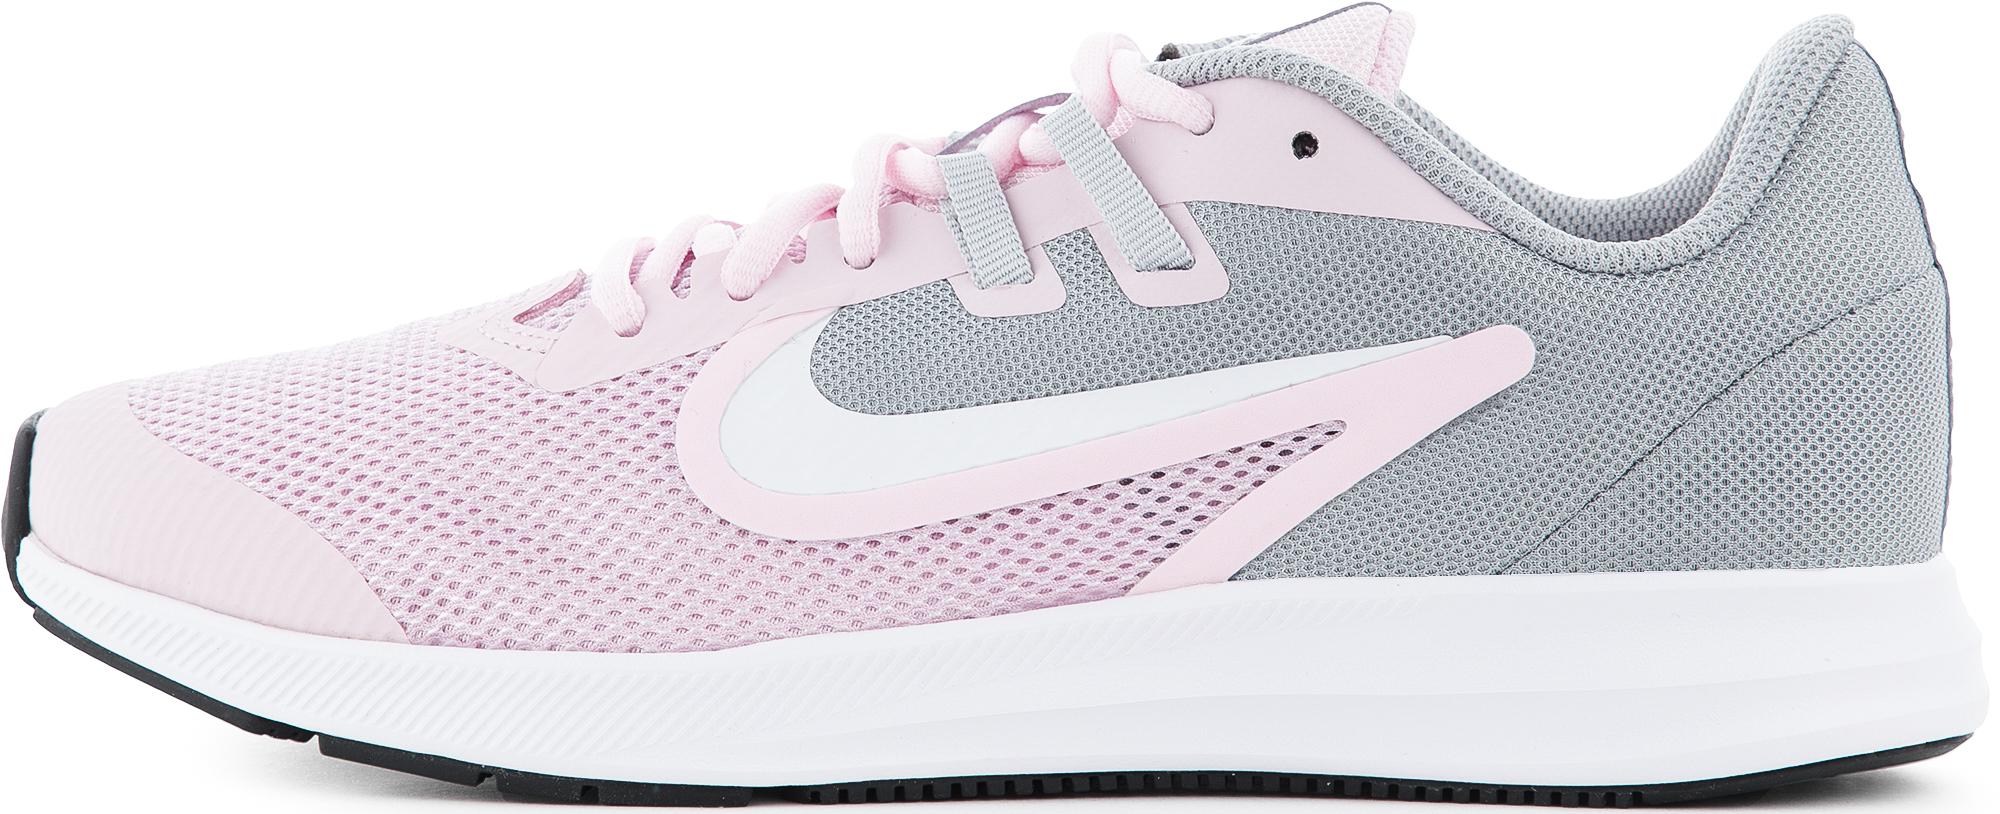 Nike Кроссовки для девочек Nike Downshifter 9 (Gs), размер 37,5